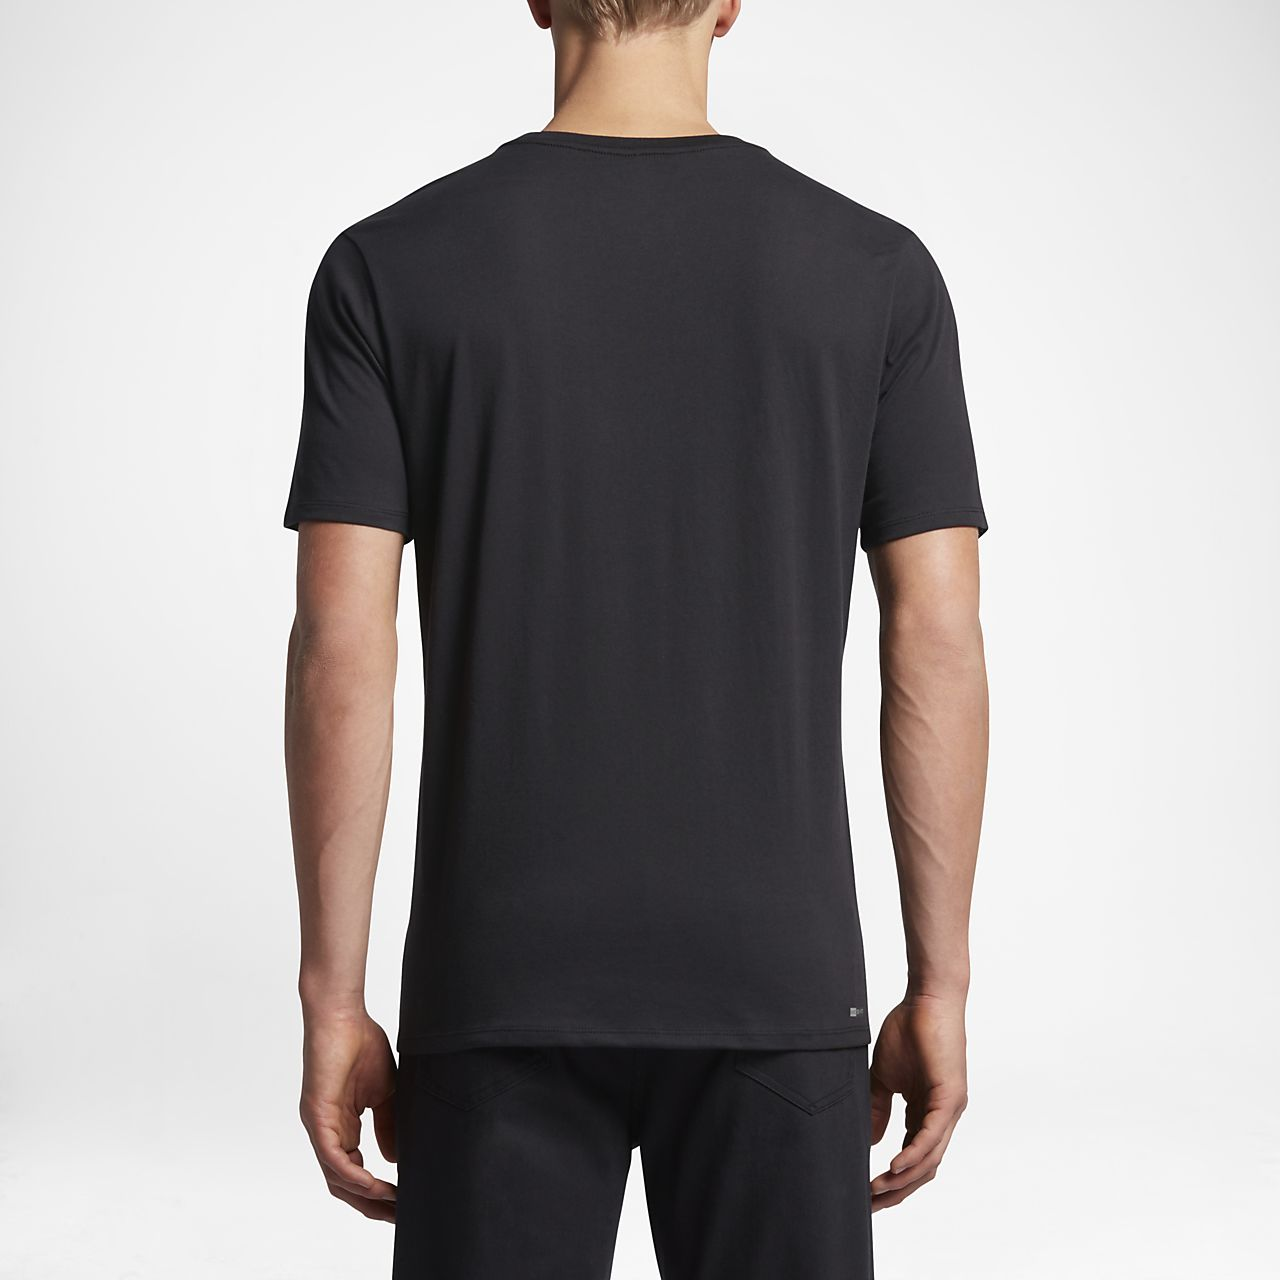 ... Hurley Dri-FIT Icon Men's T-Shirt